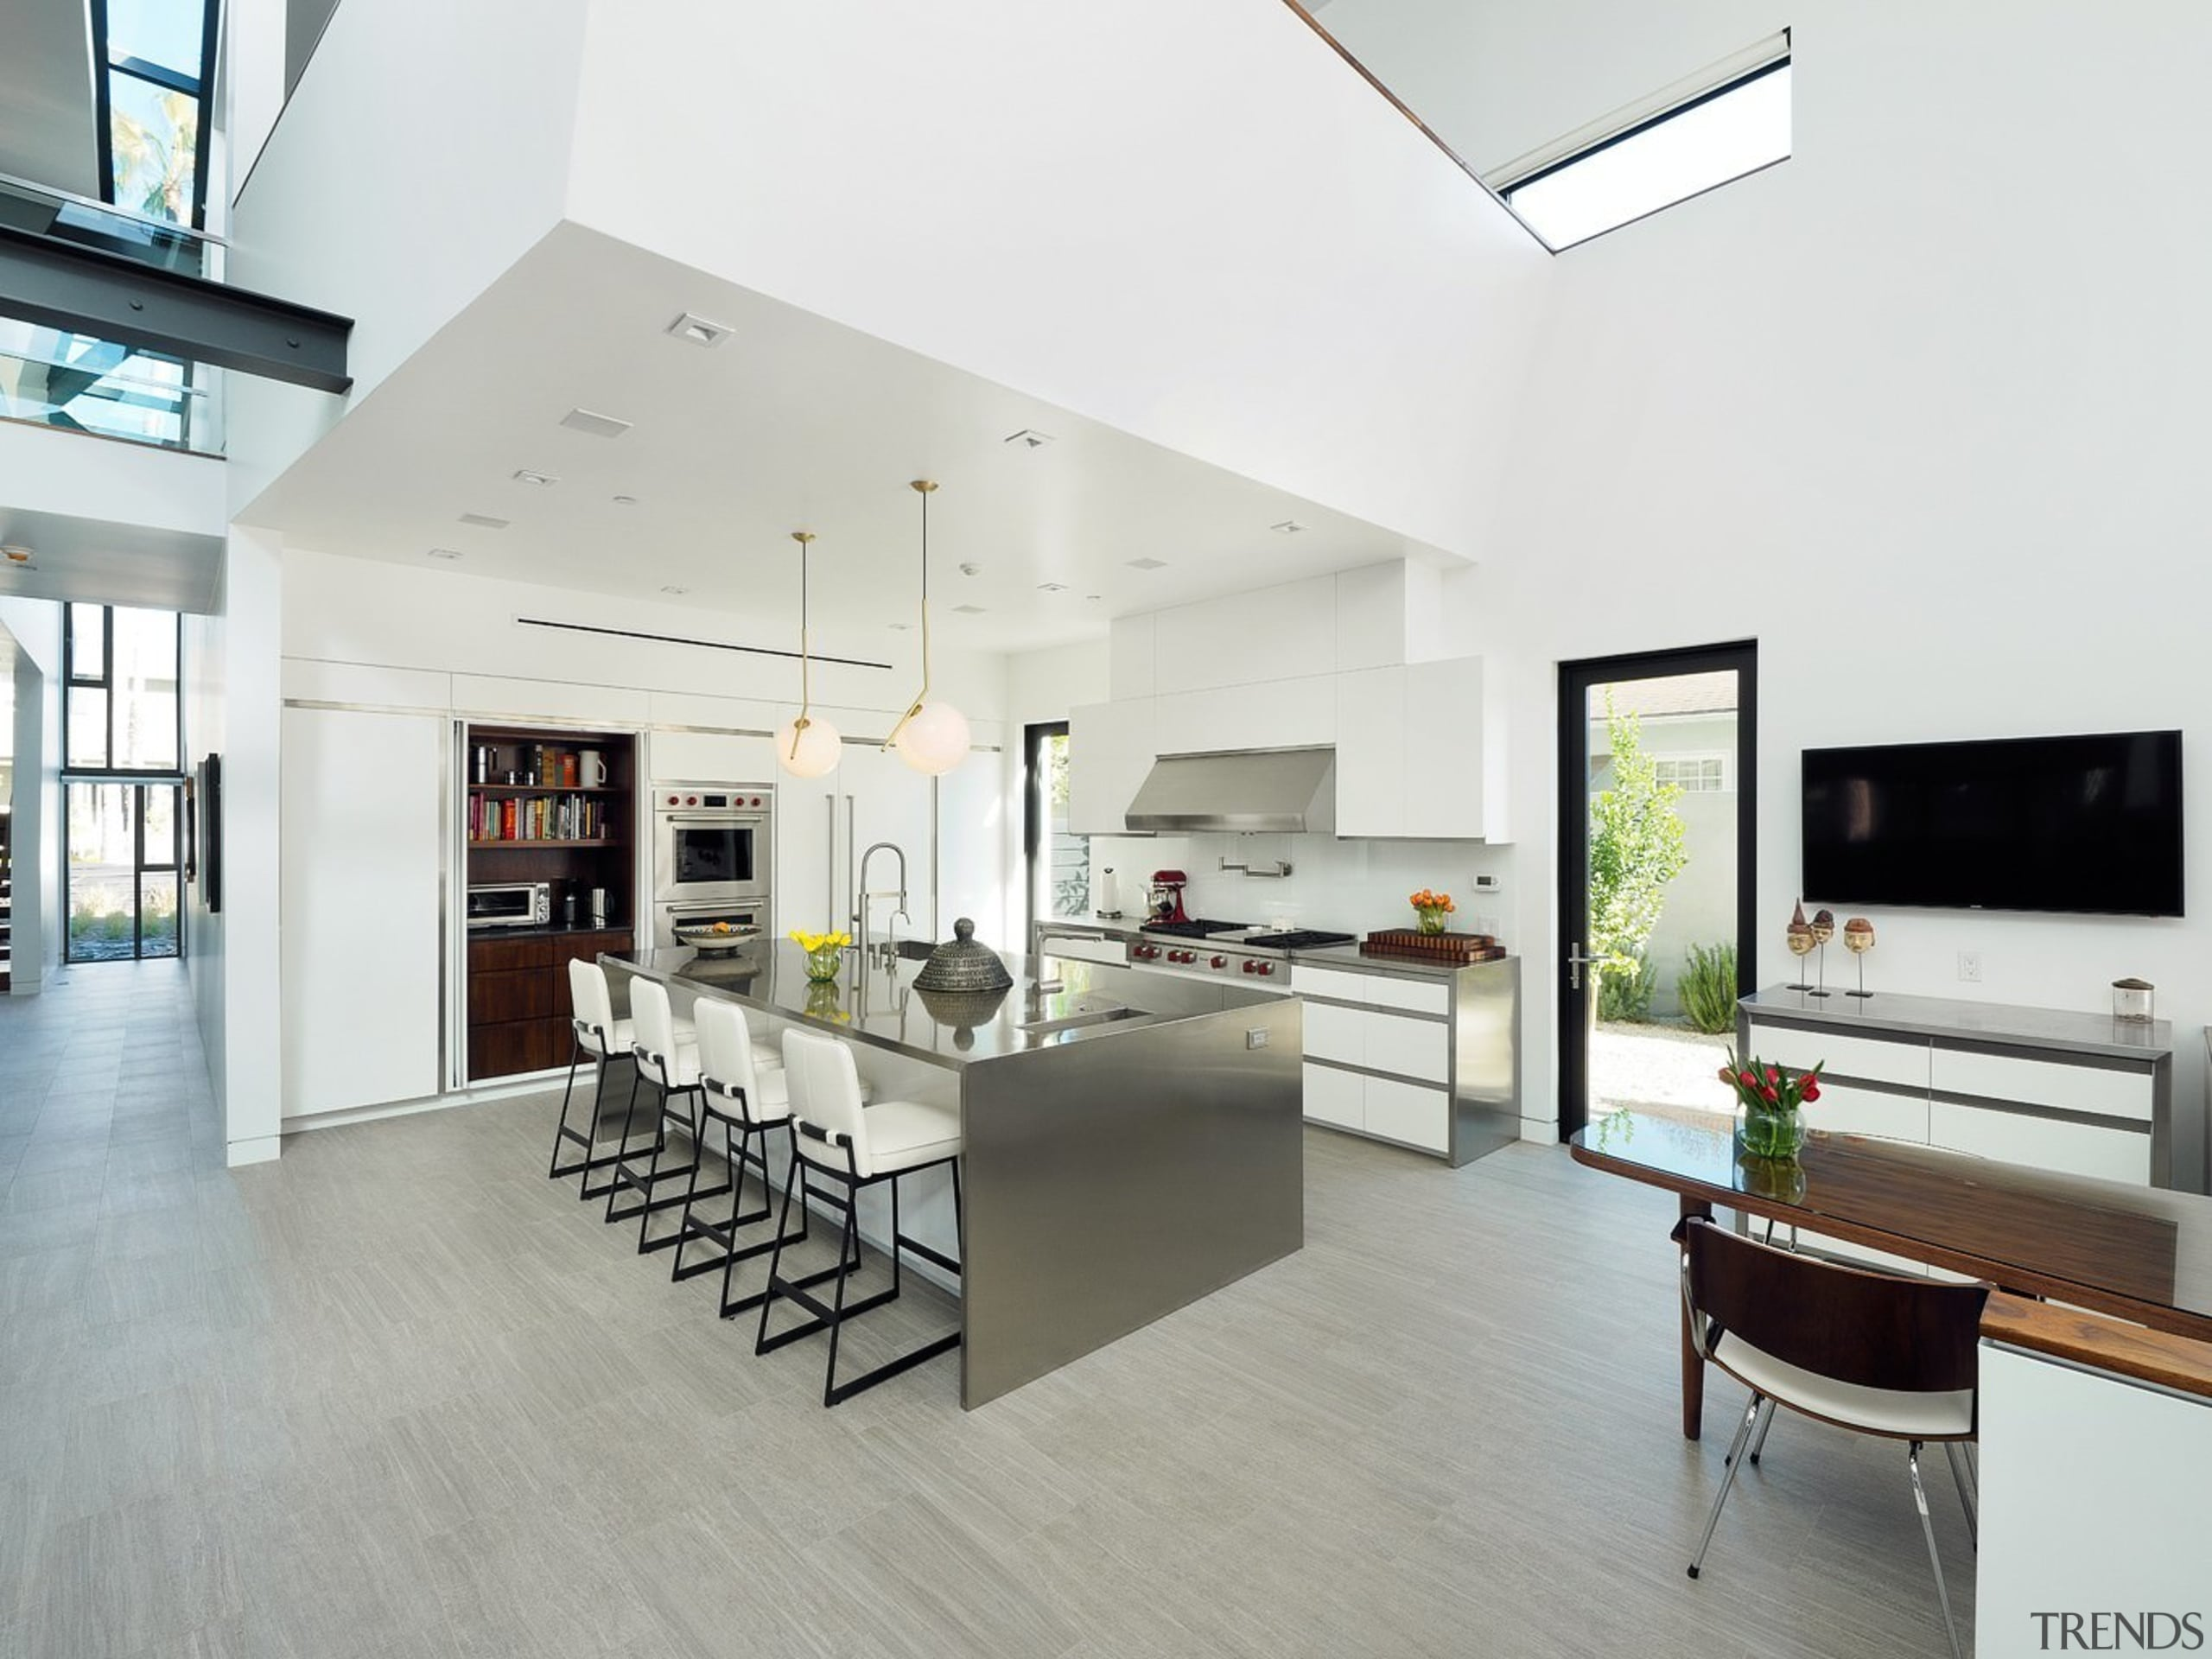 The balcony sits above the kitchen - The architecture, floor, house, interior design, interior designer, kitchen, living room, loft, real estate, white